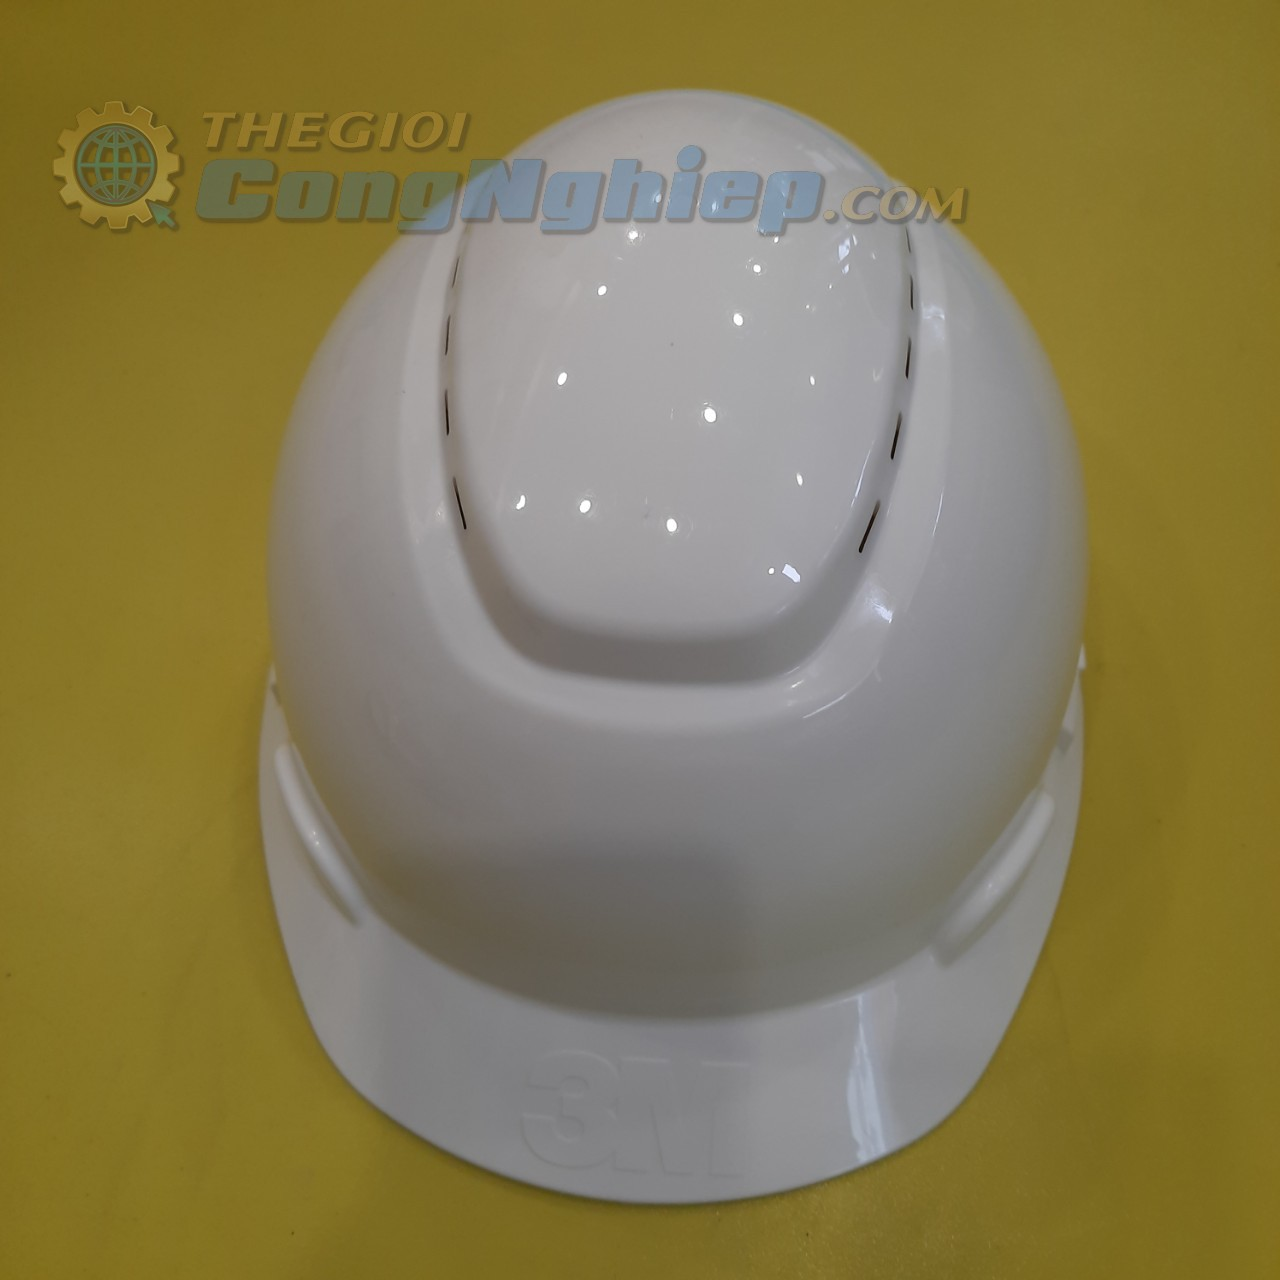 Mũ bảo hộ   H700 3M